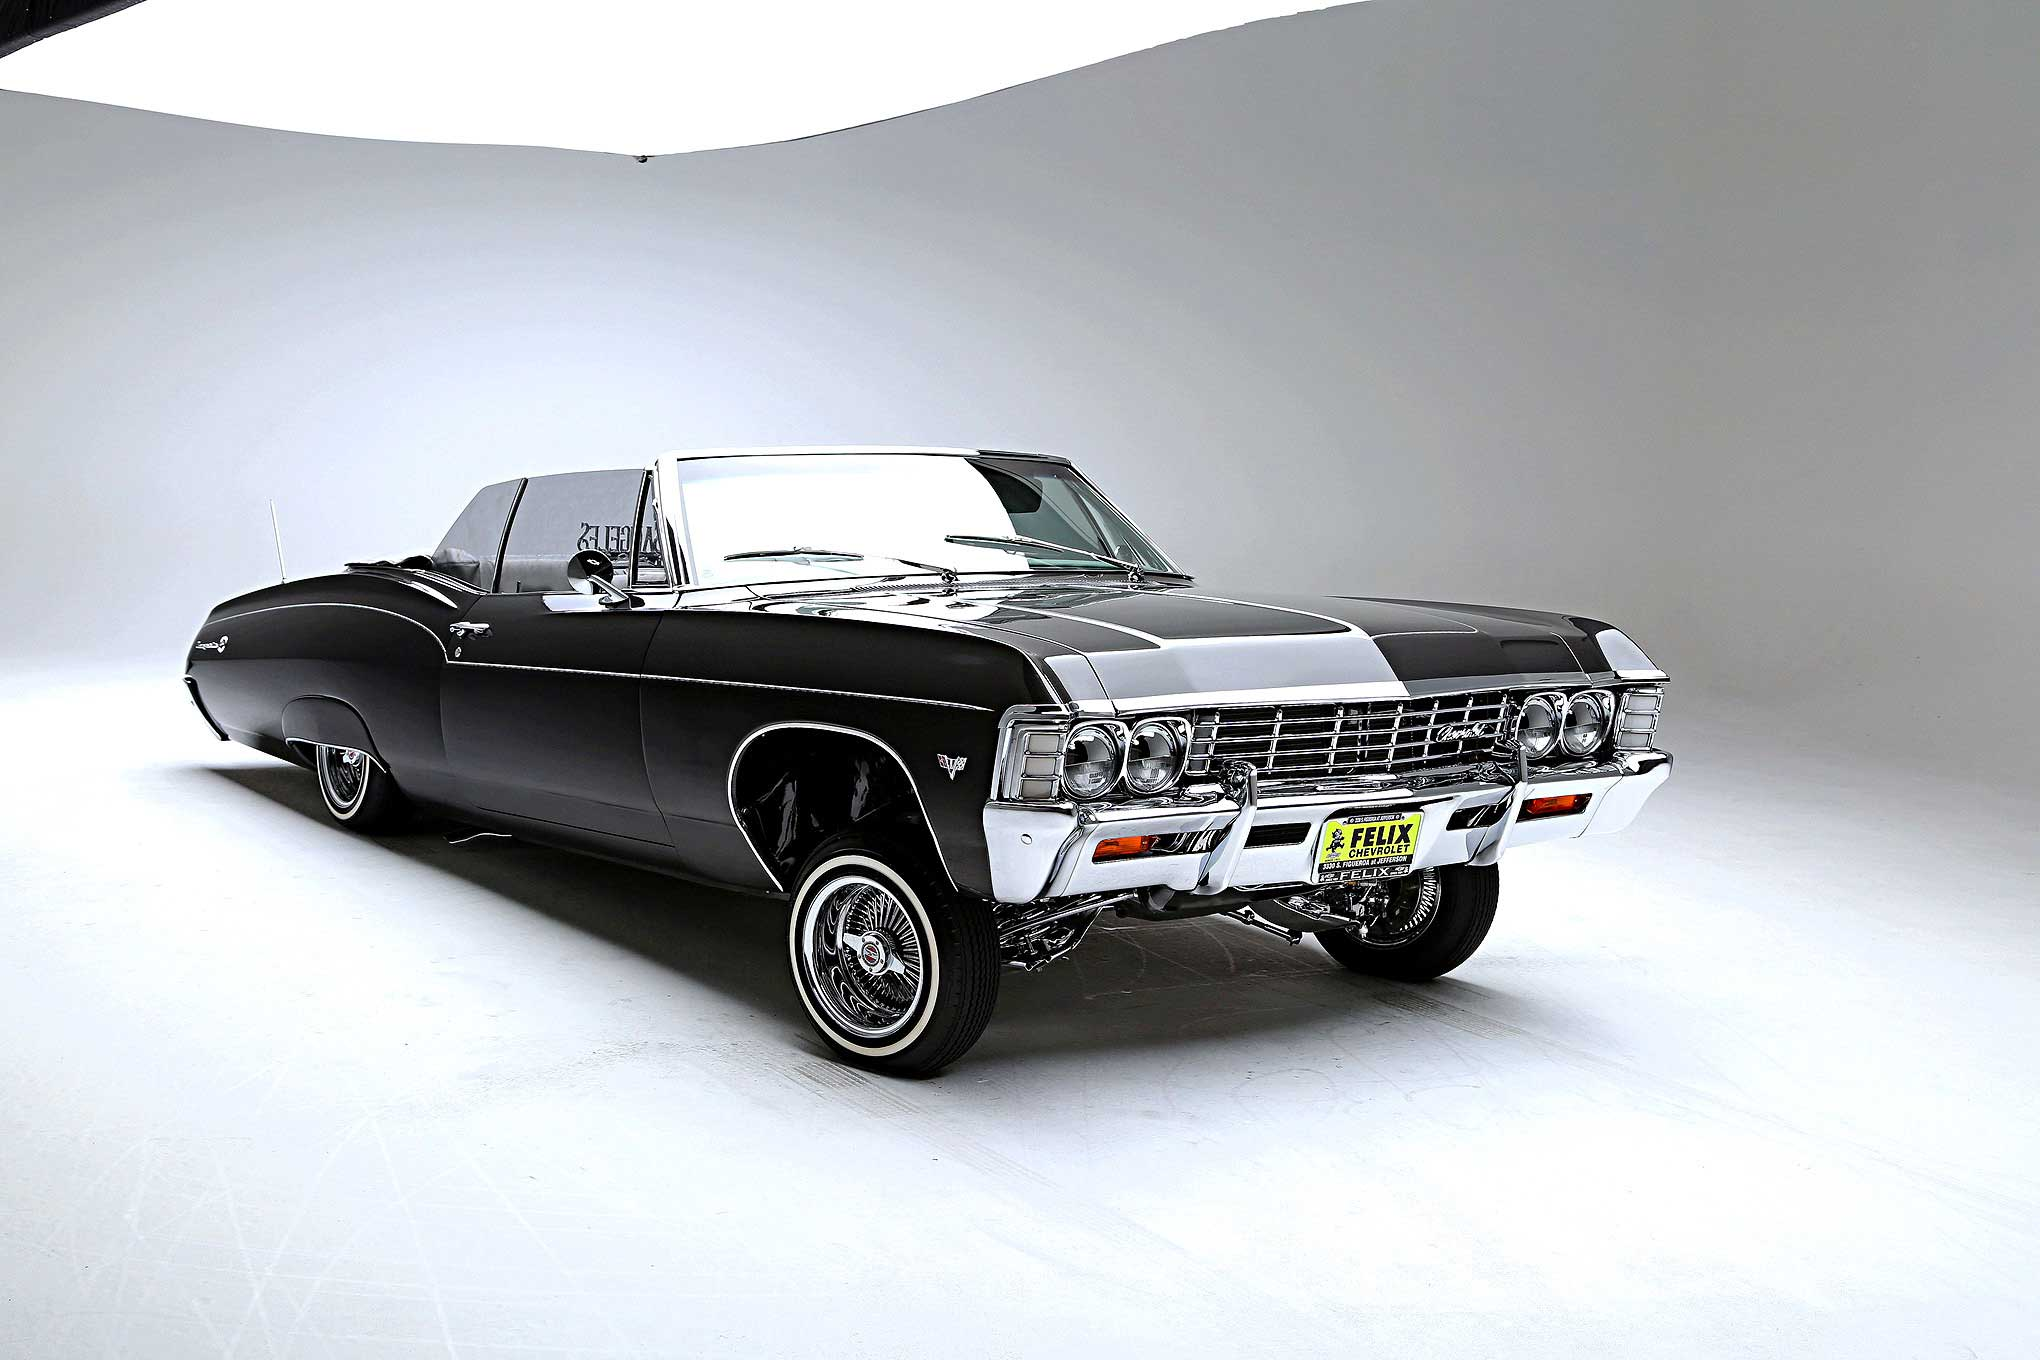 64 Impala Convertible >> 1967 Chevrolet Impala Convertible - A Poor Man's Dream